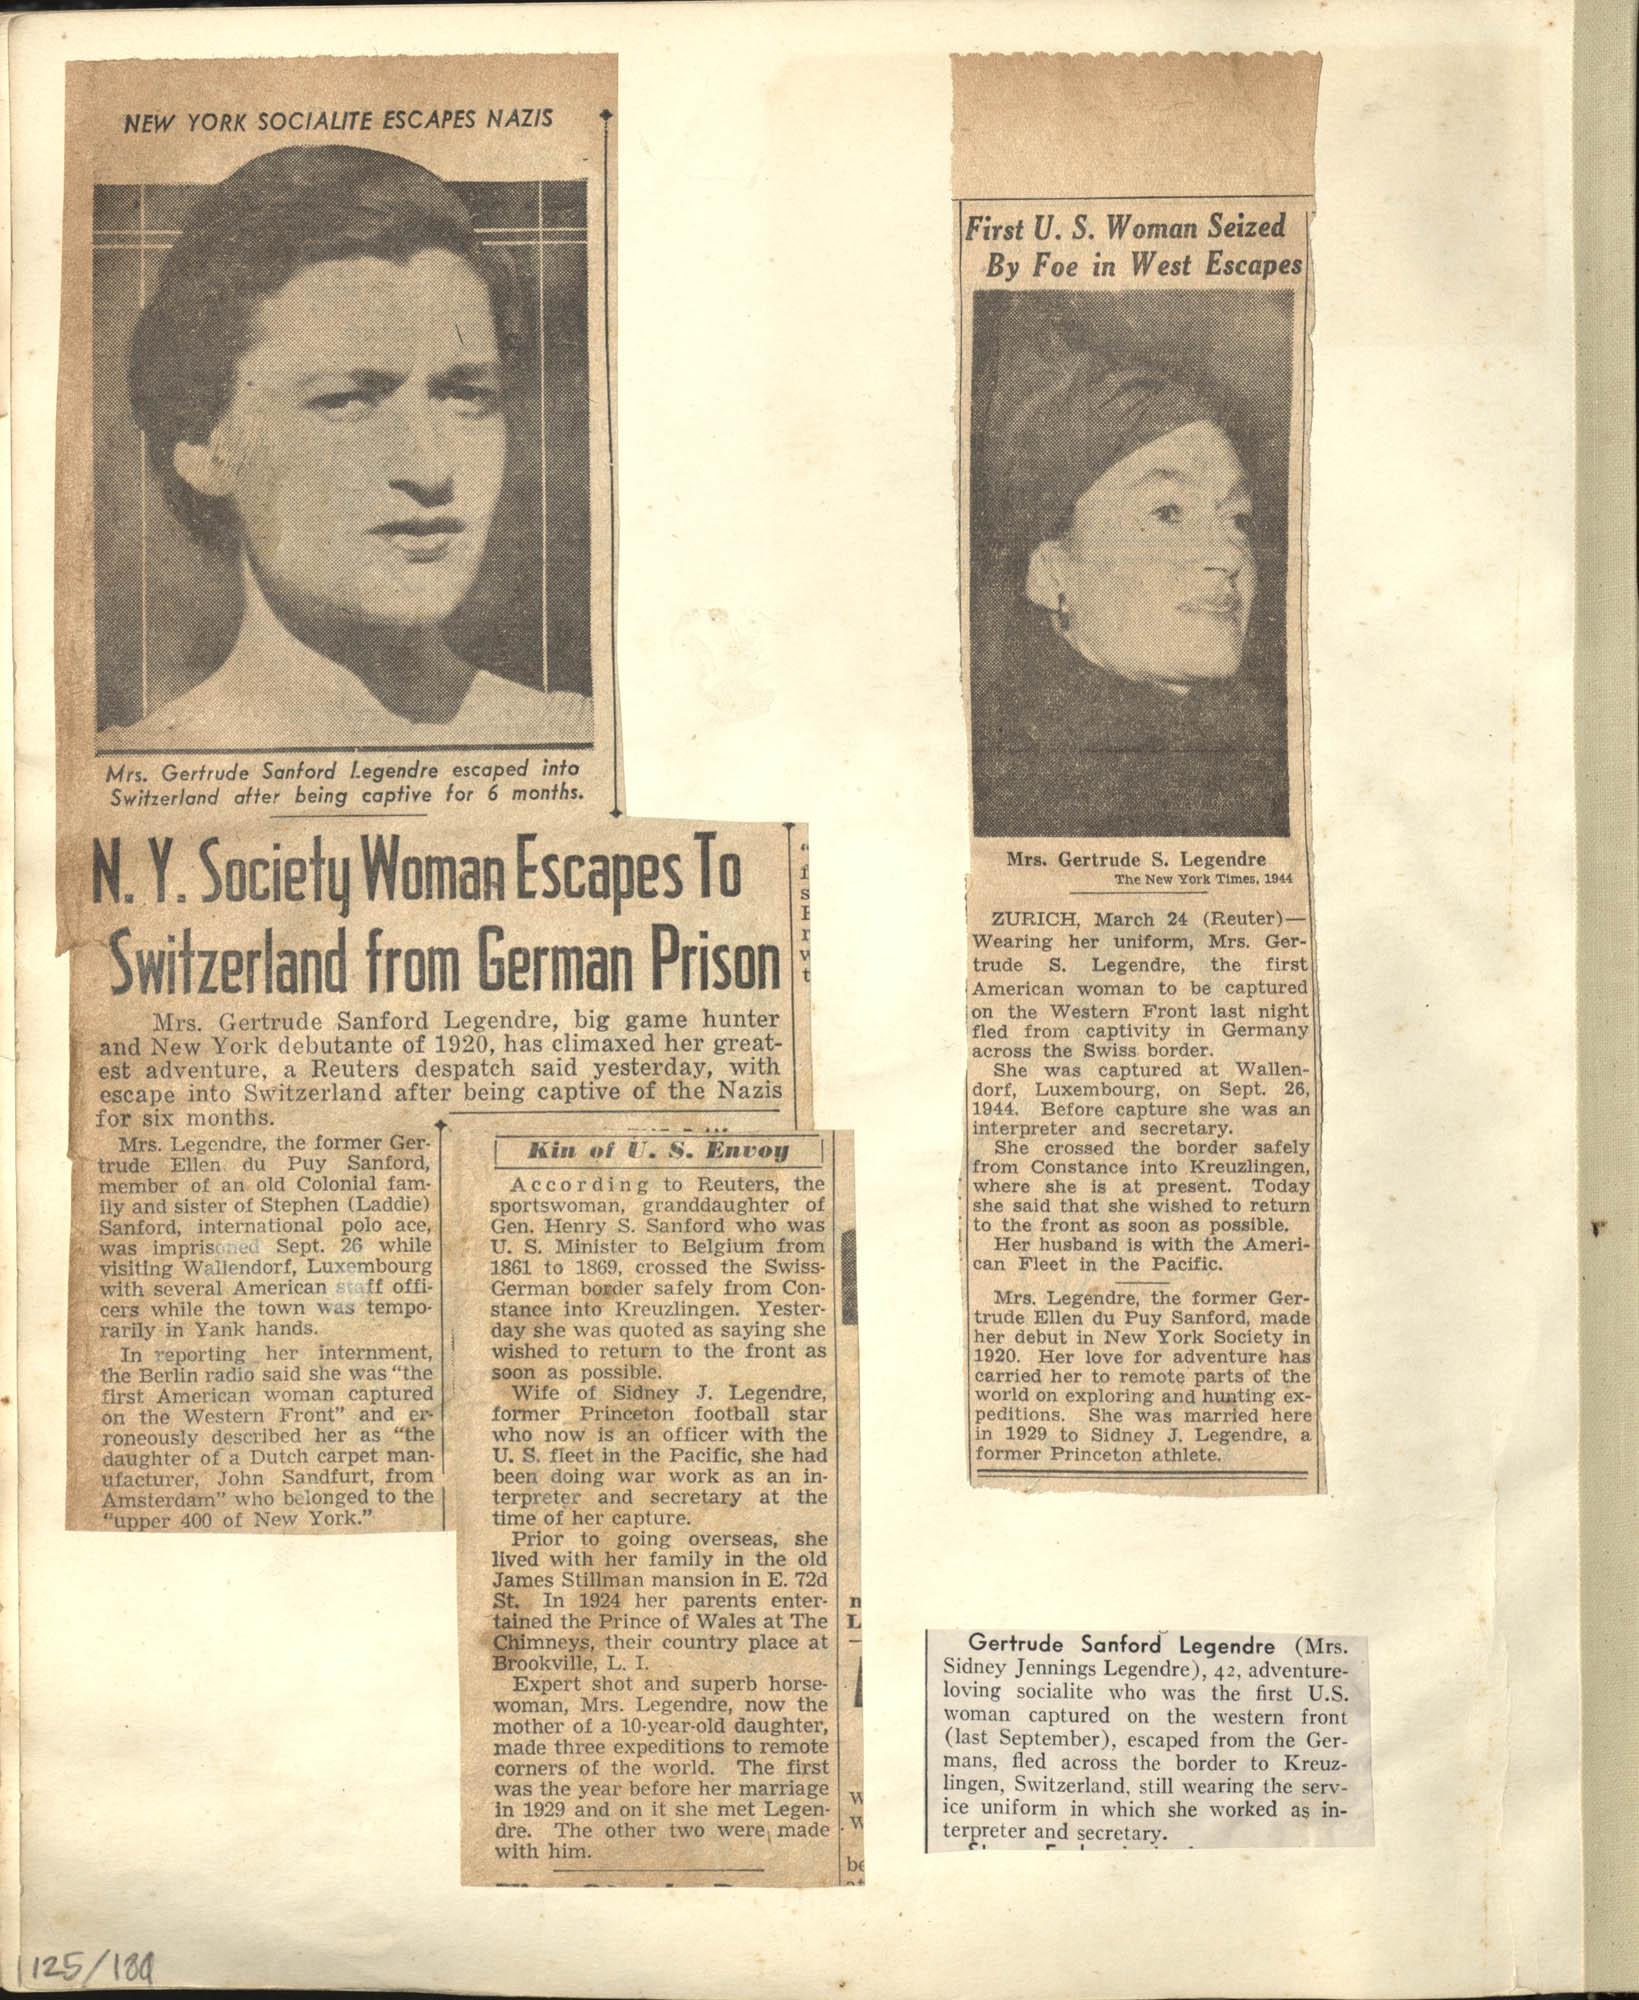 Gertrude Legendre OSS Scrapbook, 1944, Page 125